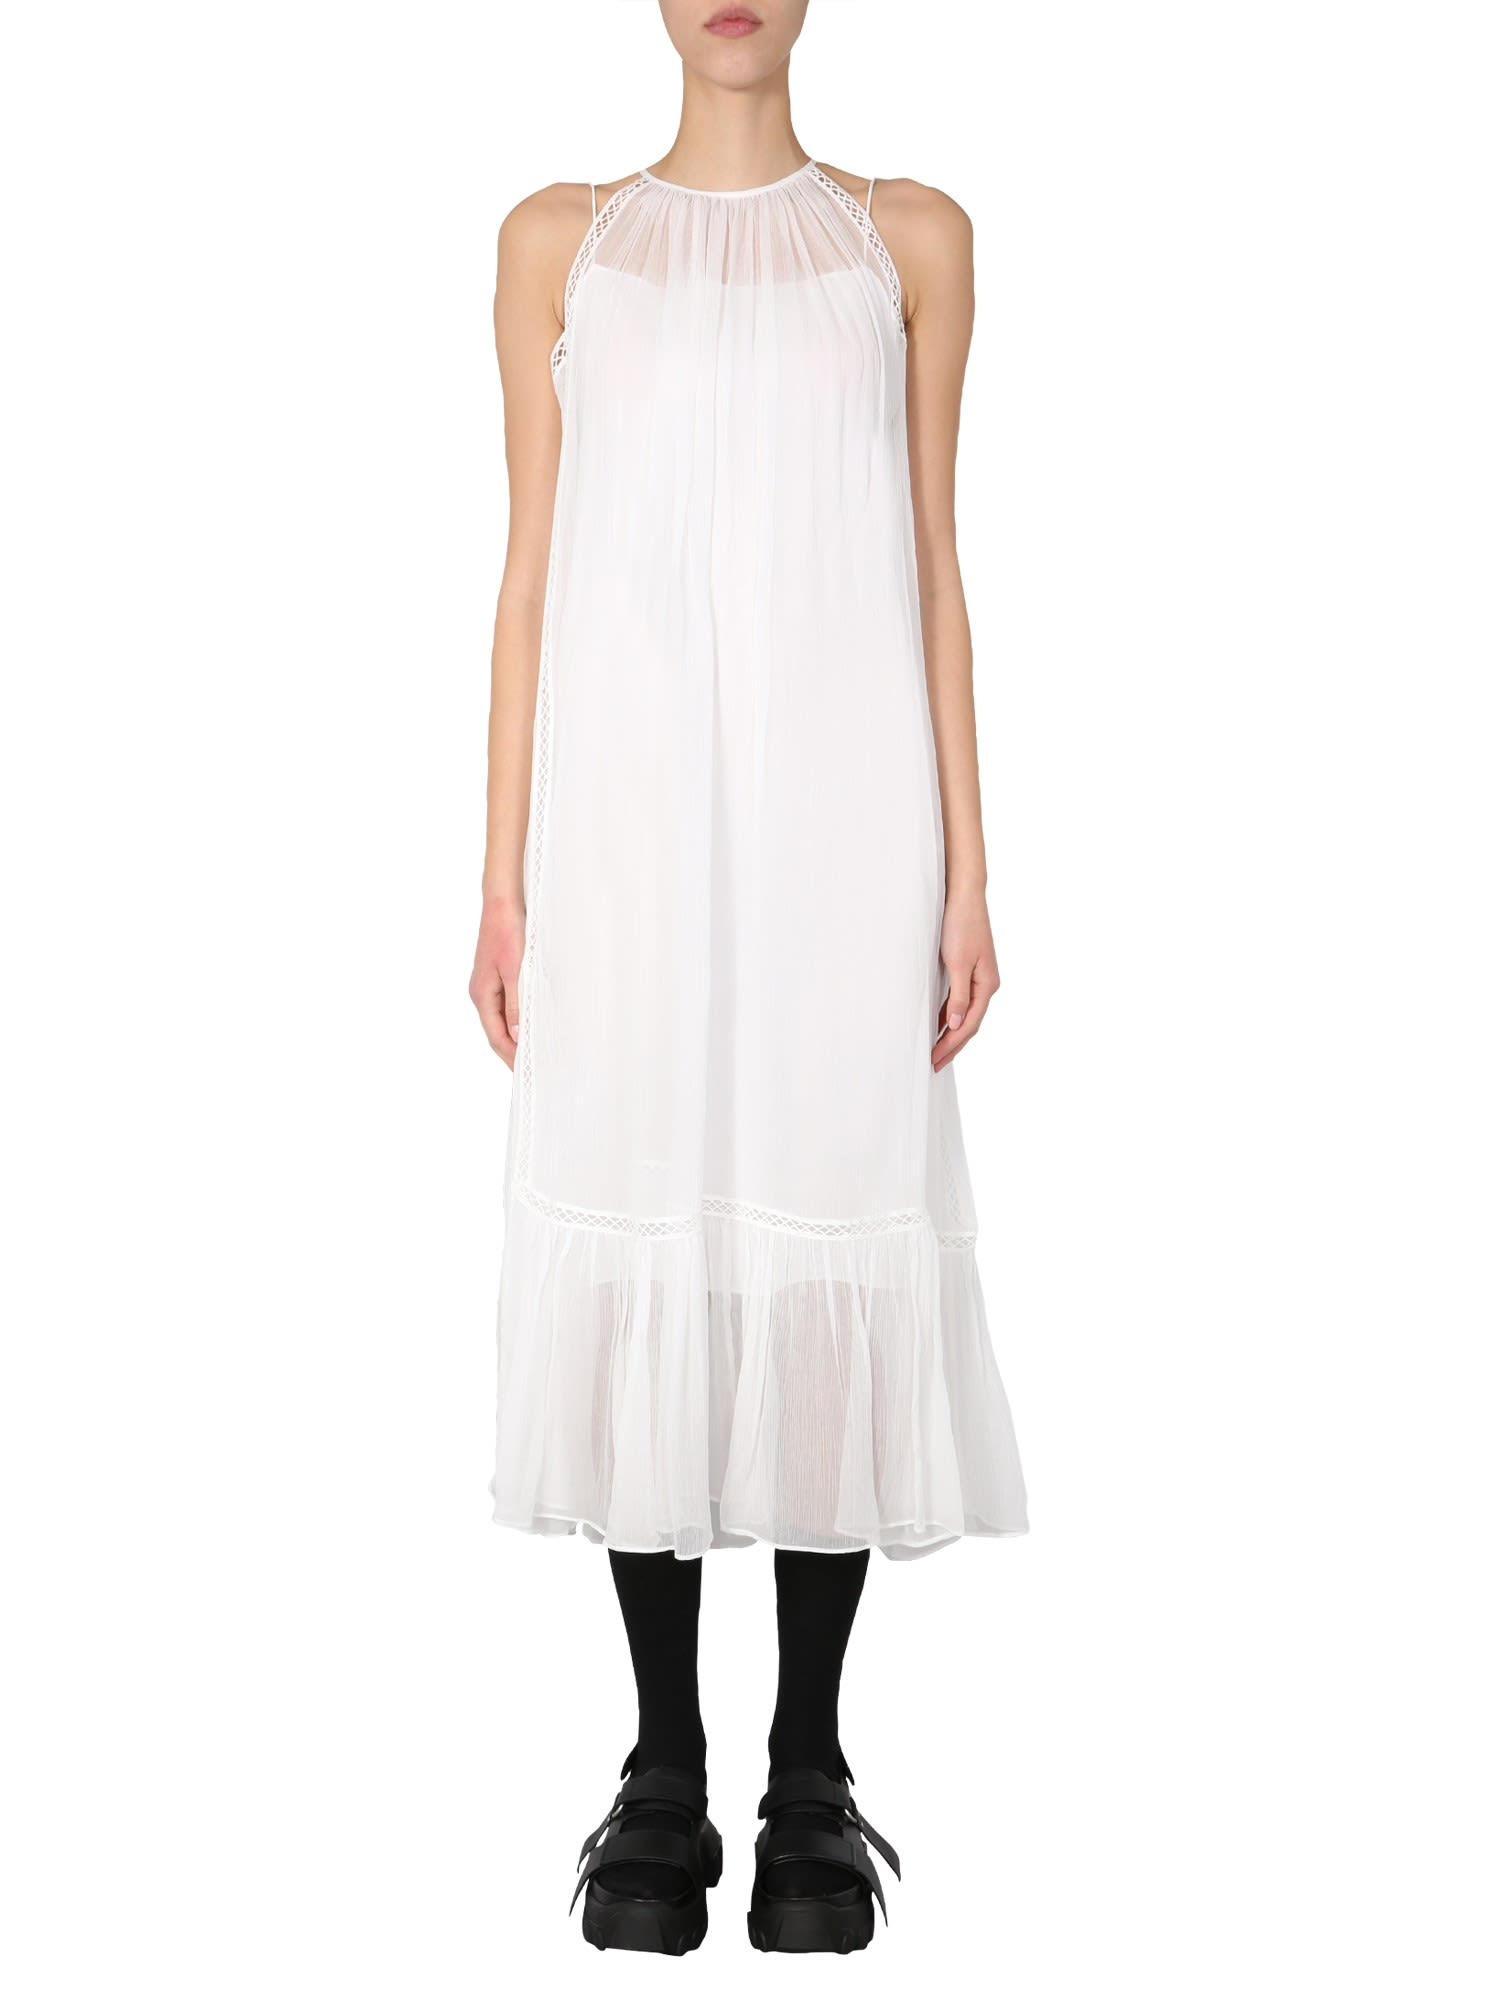 McQ Alexander McQueen Midi Dress